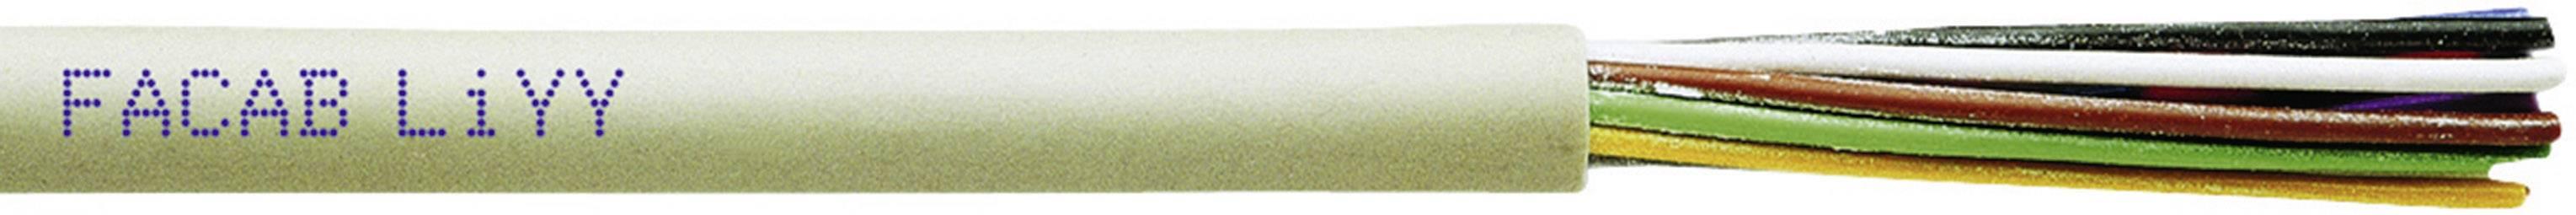 Riadiaci kábel Faber Kabel LiYY 030224, 7 x 0.34 mm², vonkajší Ø 6.60 mm, 250 V, metrový tovar, sivá